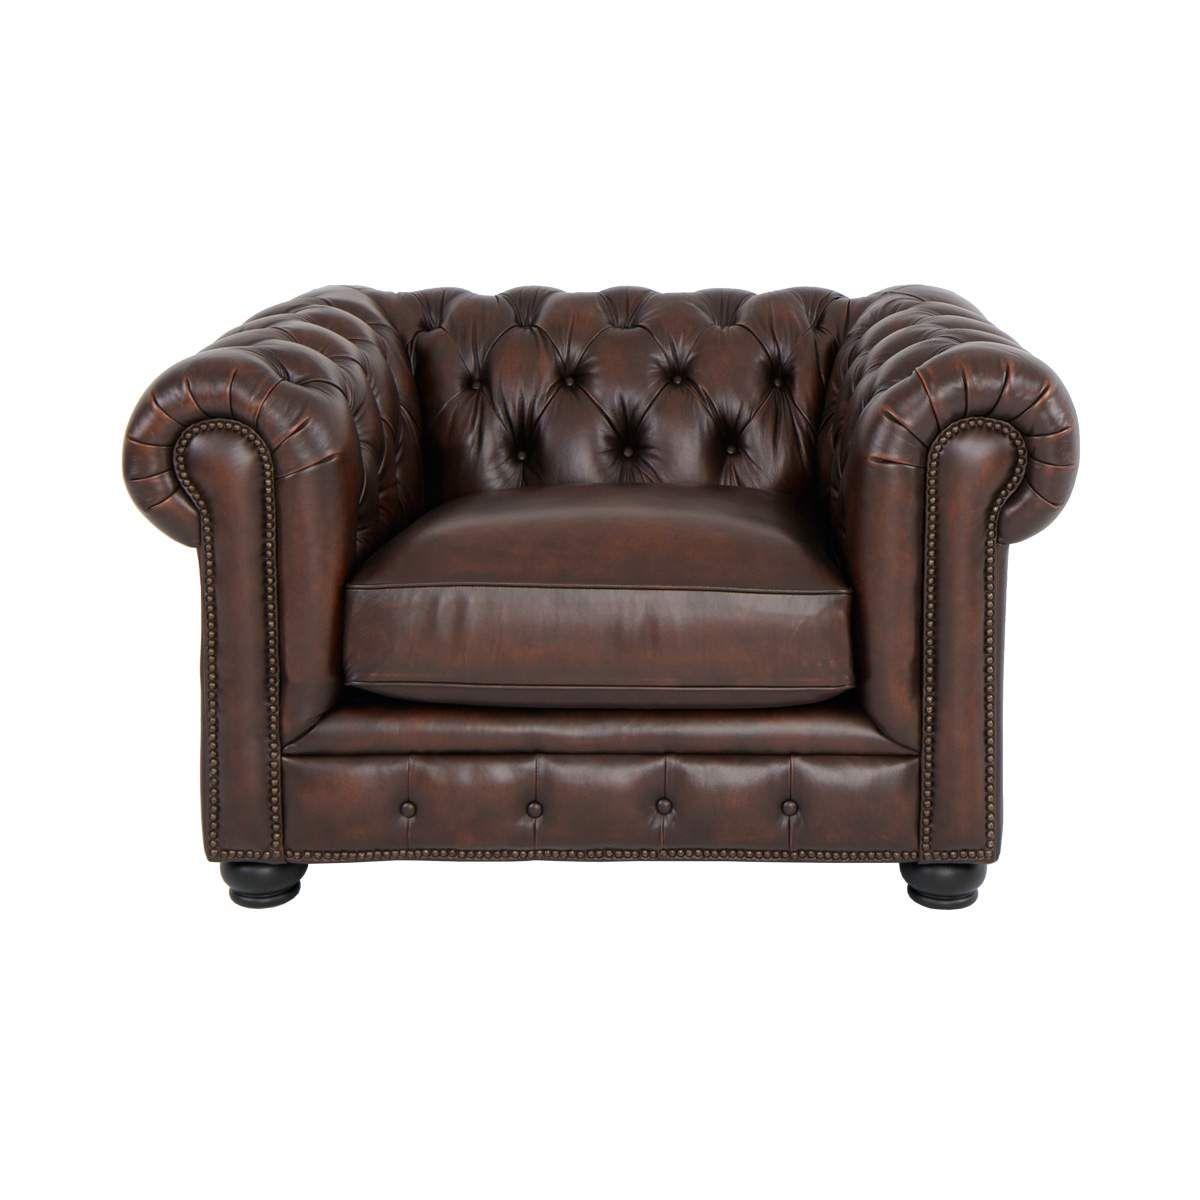 Tufted Leather Club Chair Nailhead Trim Accent Chair Jerome S Brown Leather Chairs Tufted Leather Chair Leather Chair